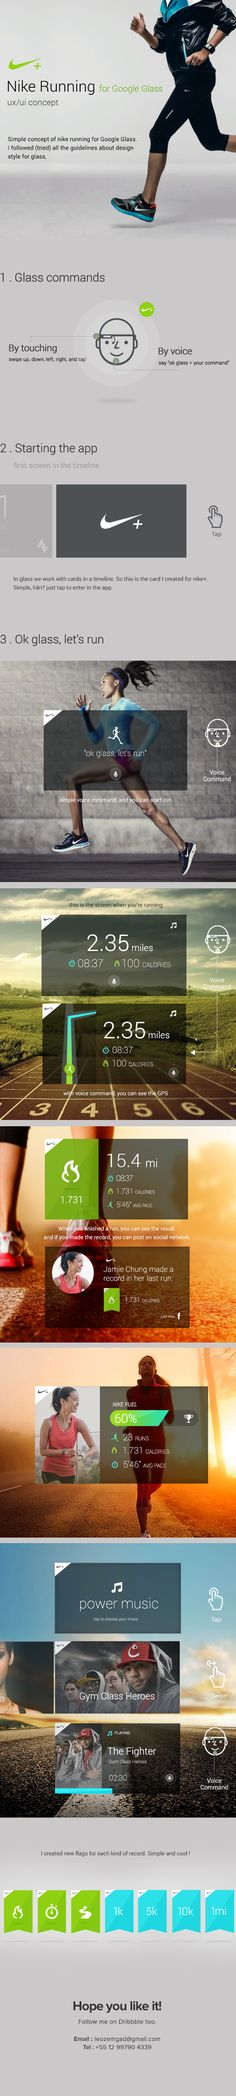 #Nike Running for #GoogleGlass by Leonardo Zem, via #Behance #UX #UI Mobile Ui Design, Web Ui Design, Site Design, Nike Running, Running Shoes, Digital Web, Service Design, Interface Design, User Interface